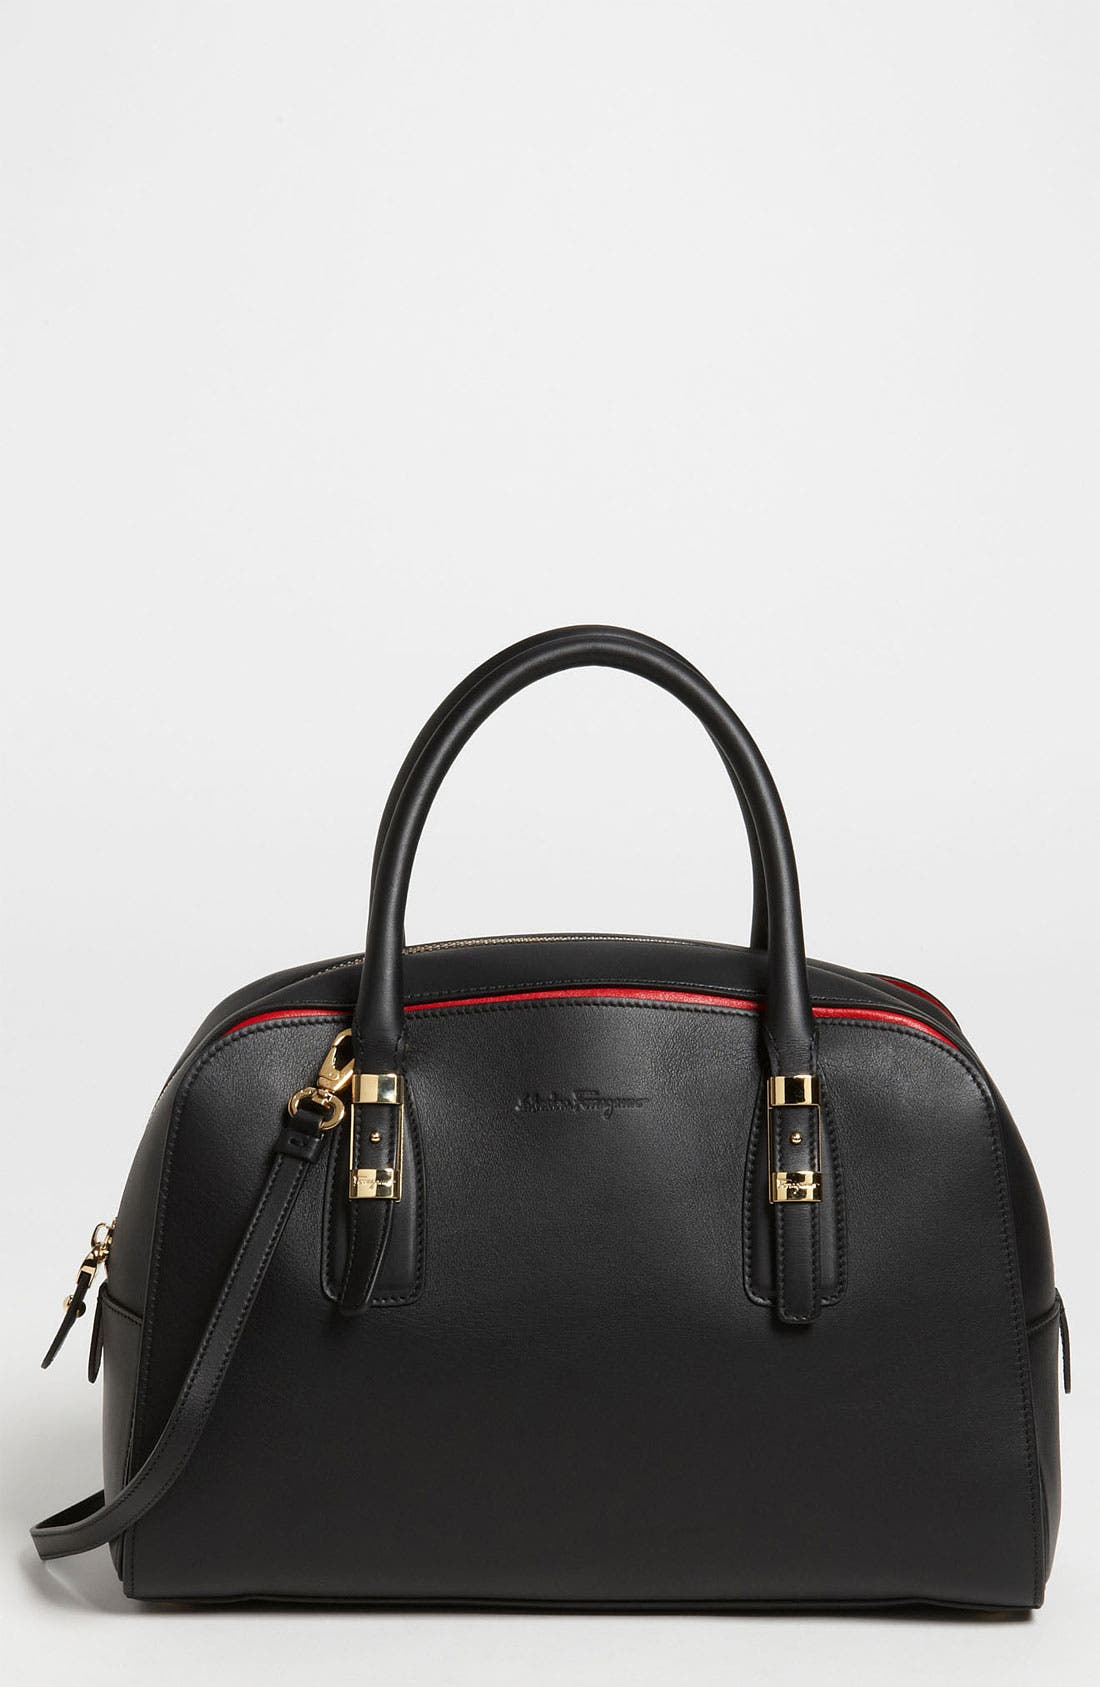 Main Image - Salvatore Ferragamo 'Emmy - Small' Leather Crossbody Bag